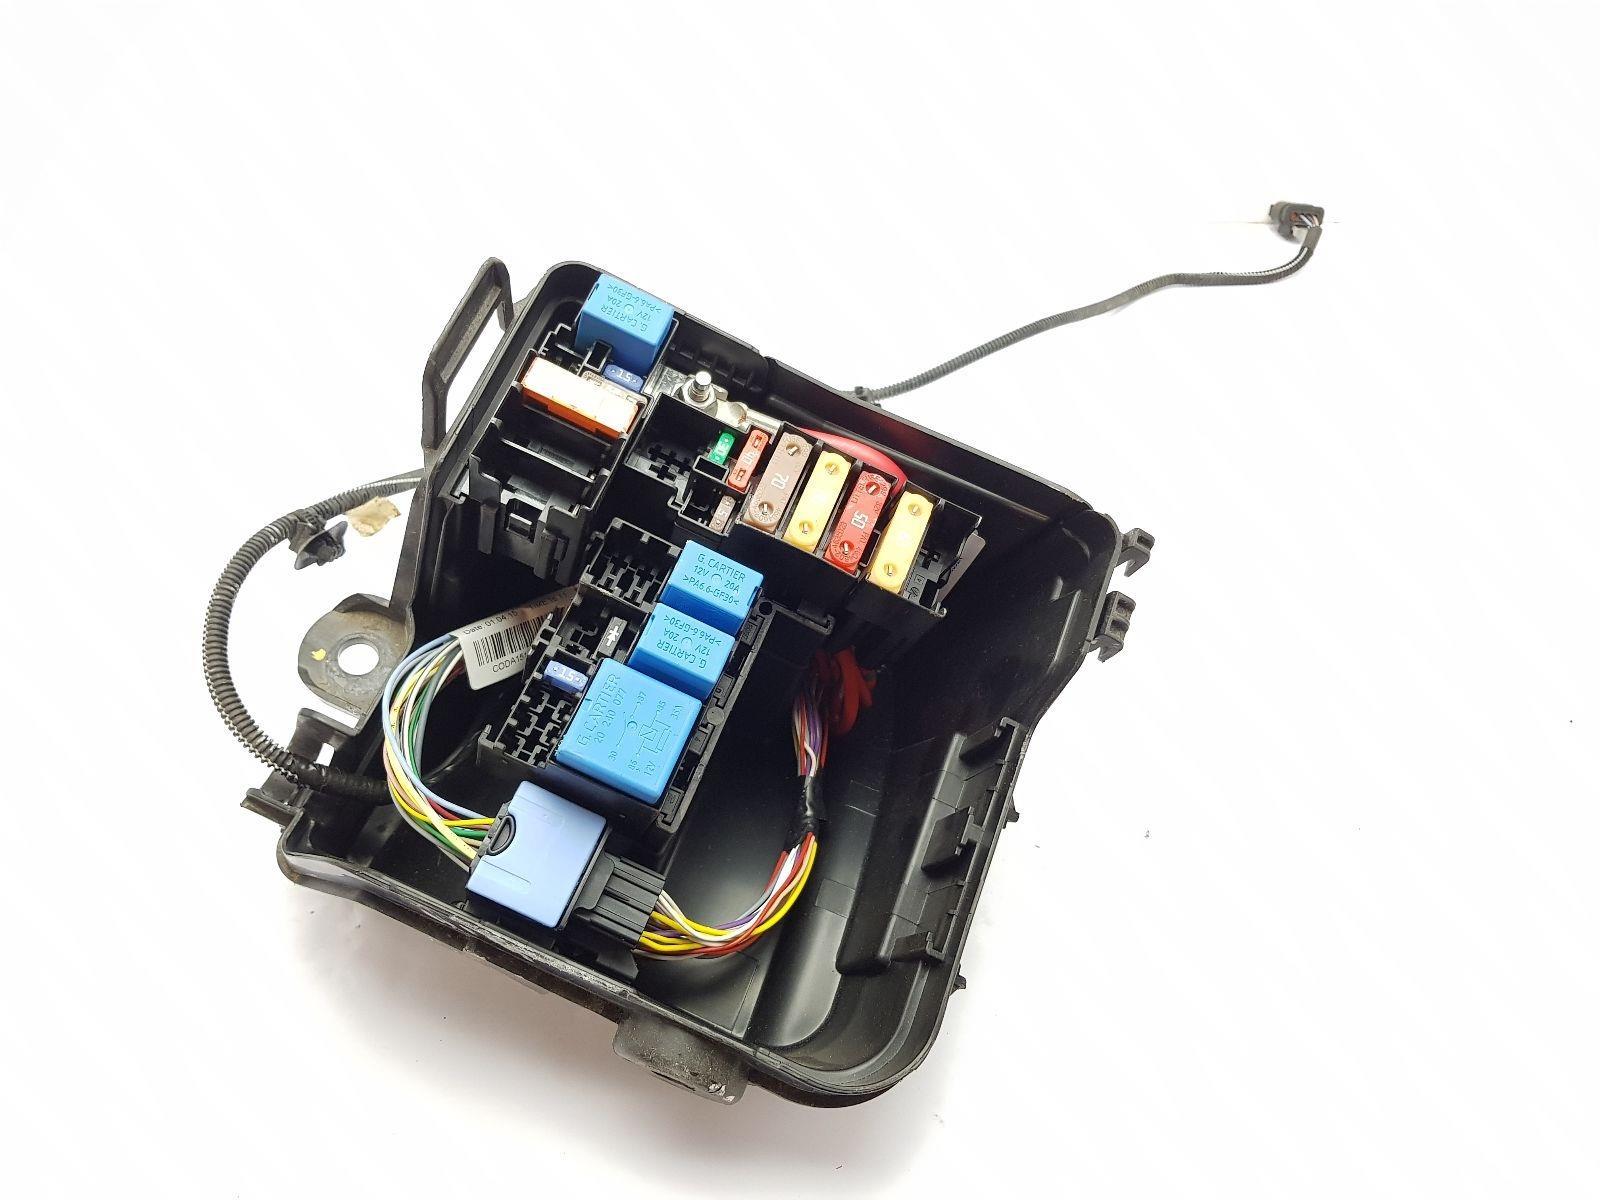 hight resolution of 2013 2016 mk4 renault clio fuse box 0 9 petrol 243804185r